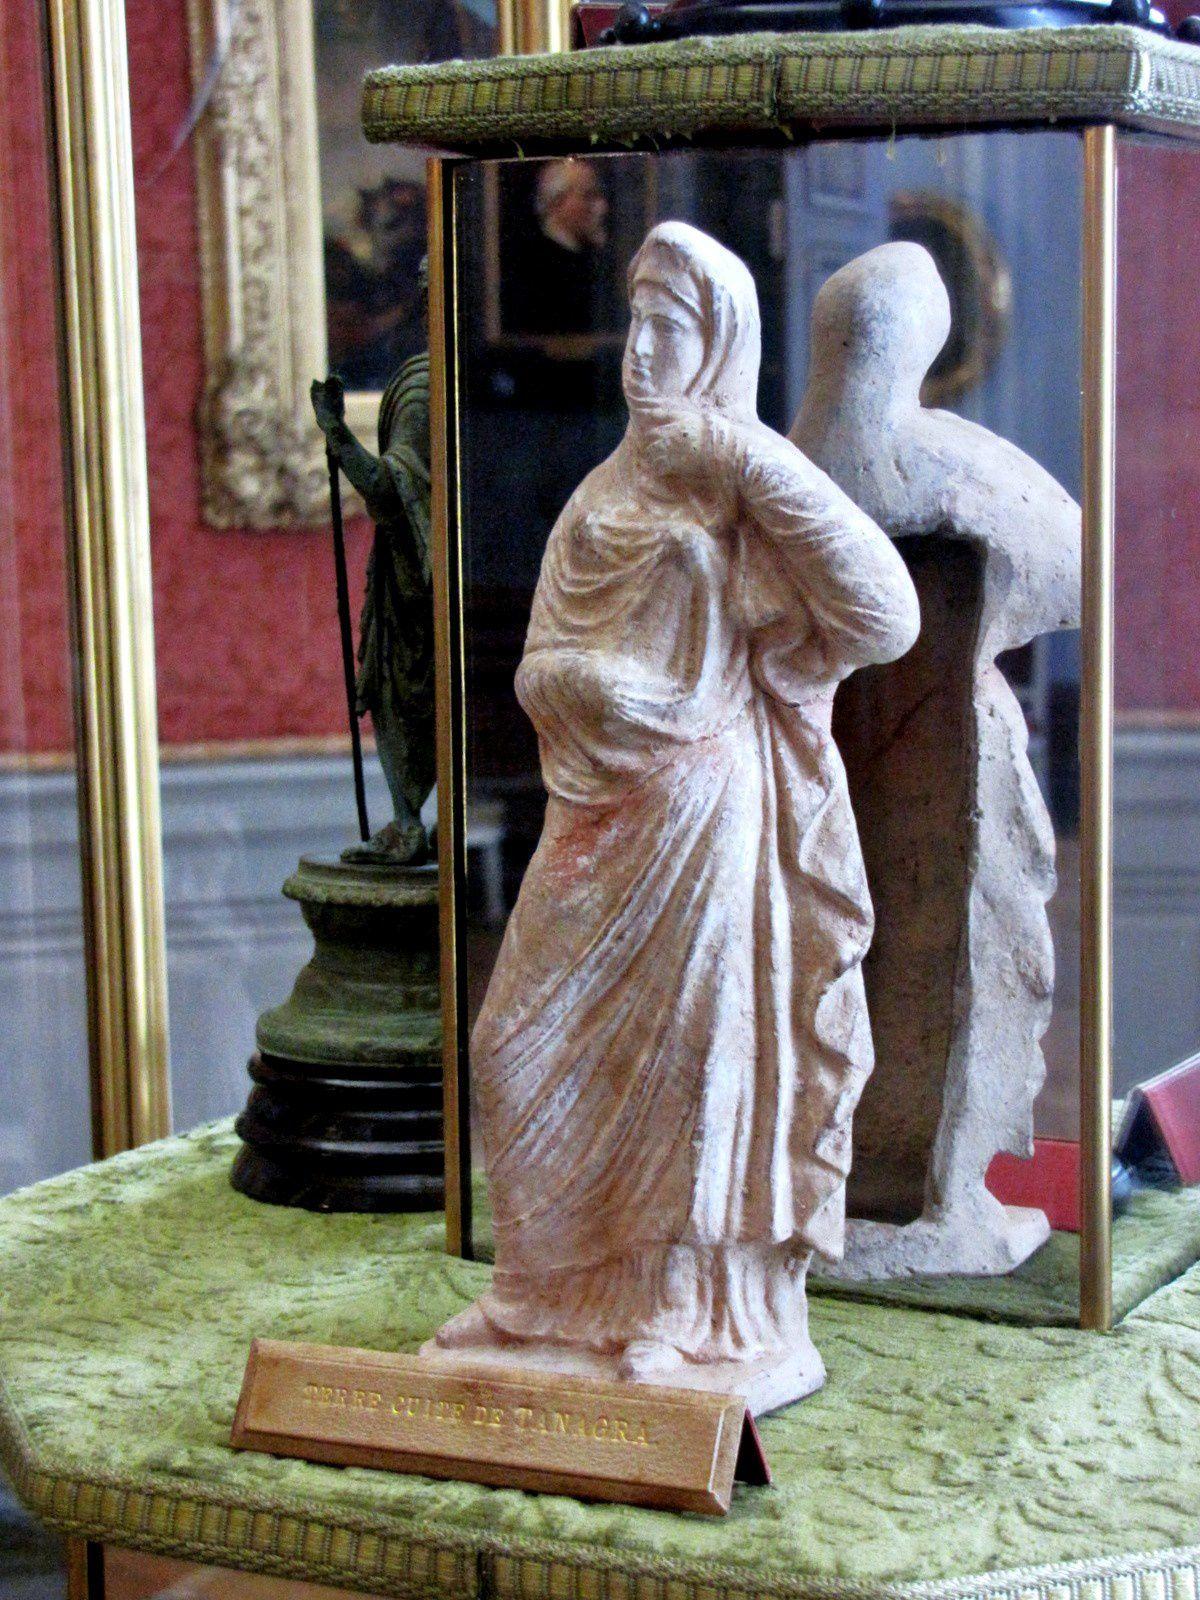 Tanagra (1/2), musée Condé (château de Chantilly)